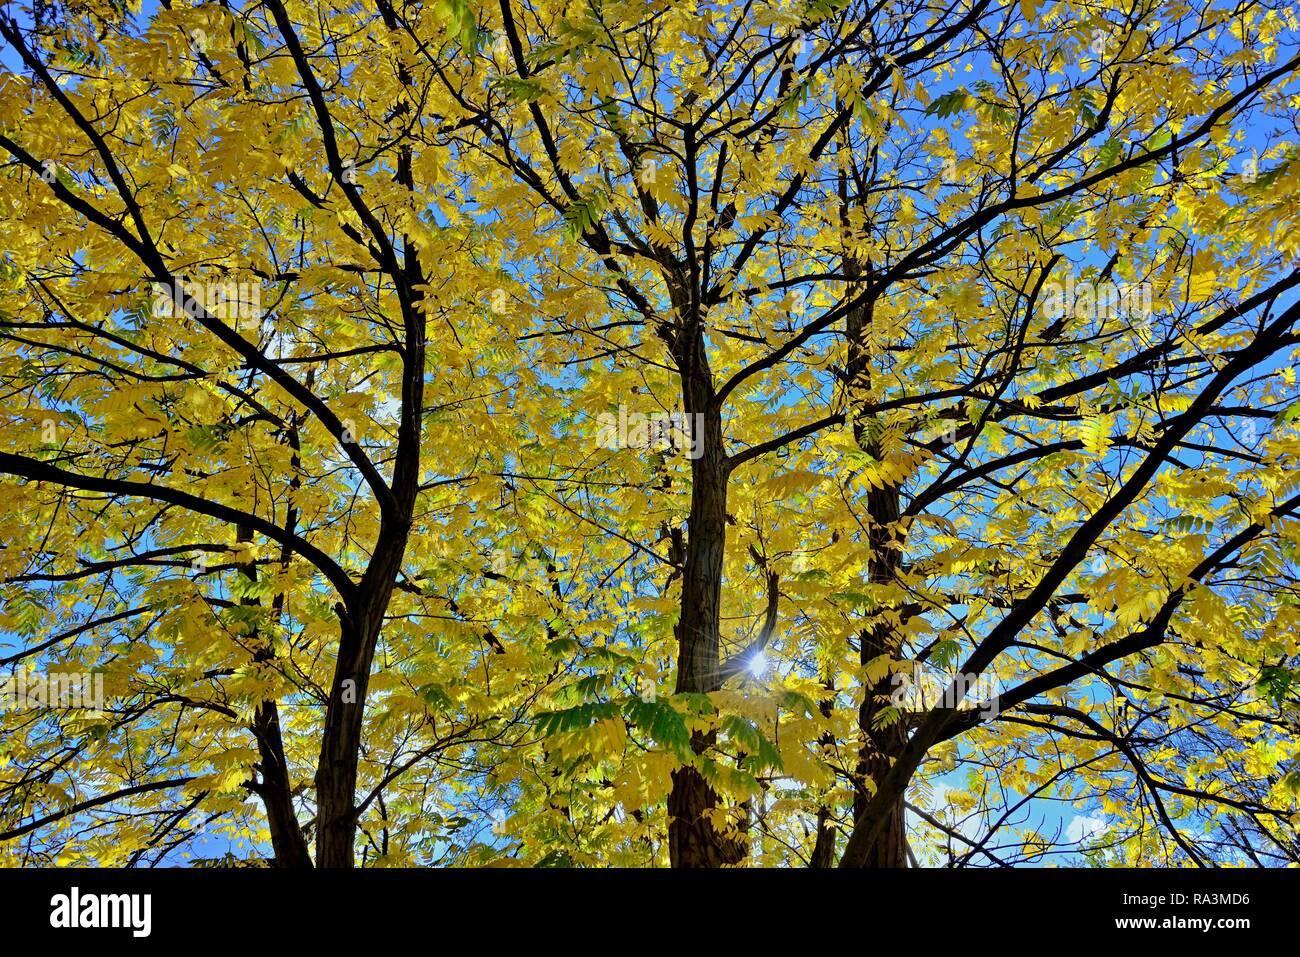 Caucasian wingnut (Pterocarya fraxinifolia), treetops with autumn leaves against a blue sky, North Rhine-Westphalia, Germany - Stock Image